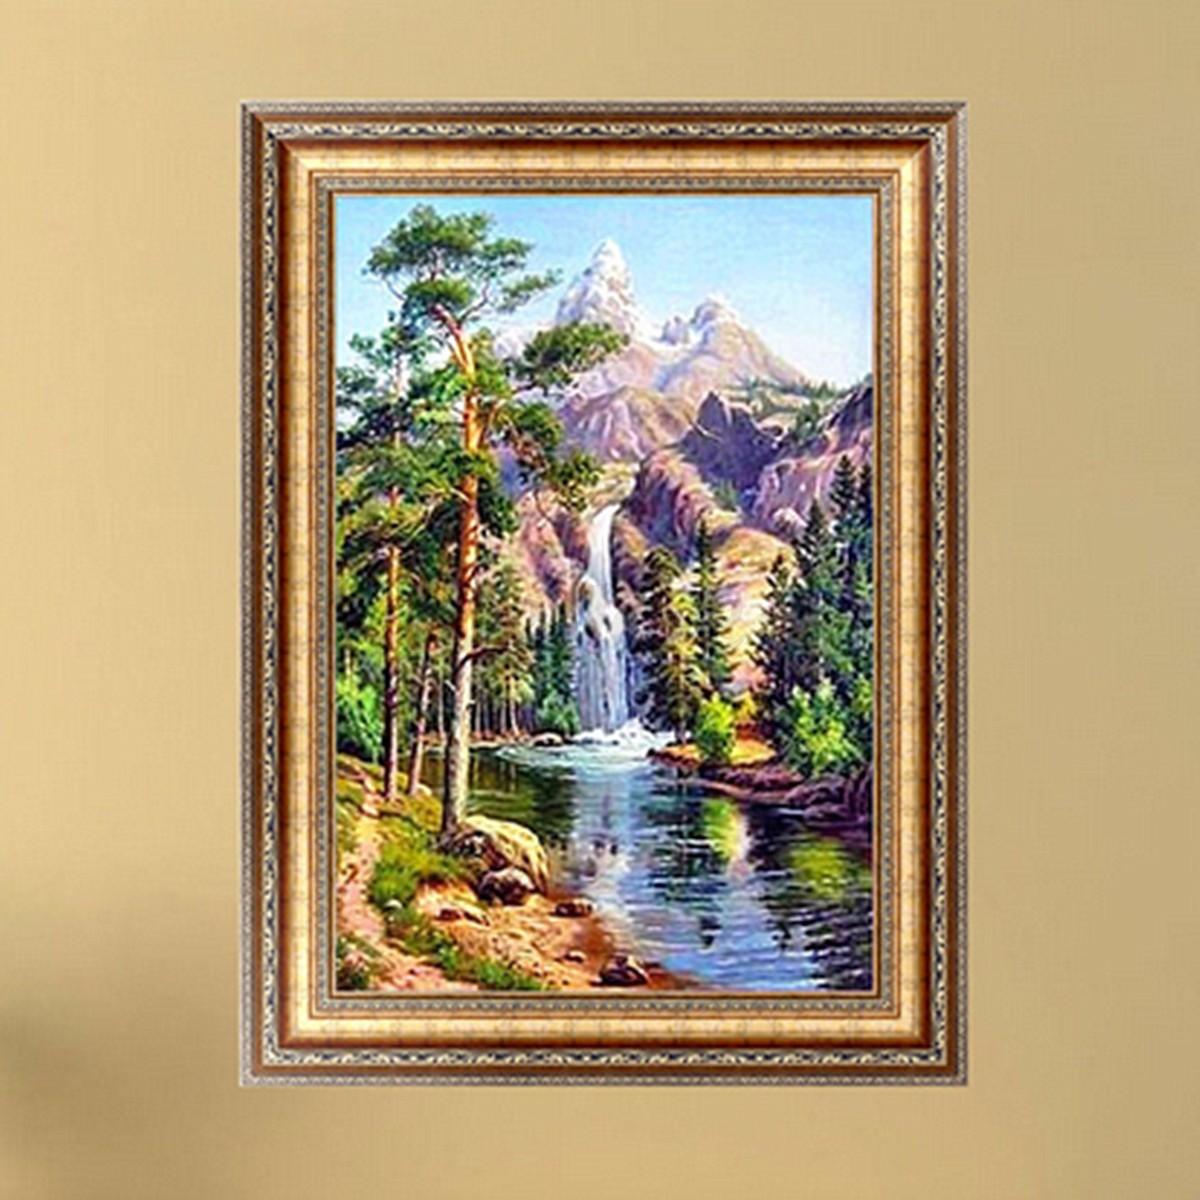 5d Diamond Tower Painting Bridge Diy Craft Handmade Embroidery Stitch Home Decor Ebay